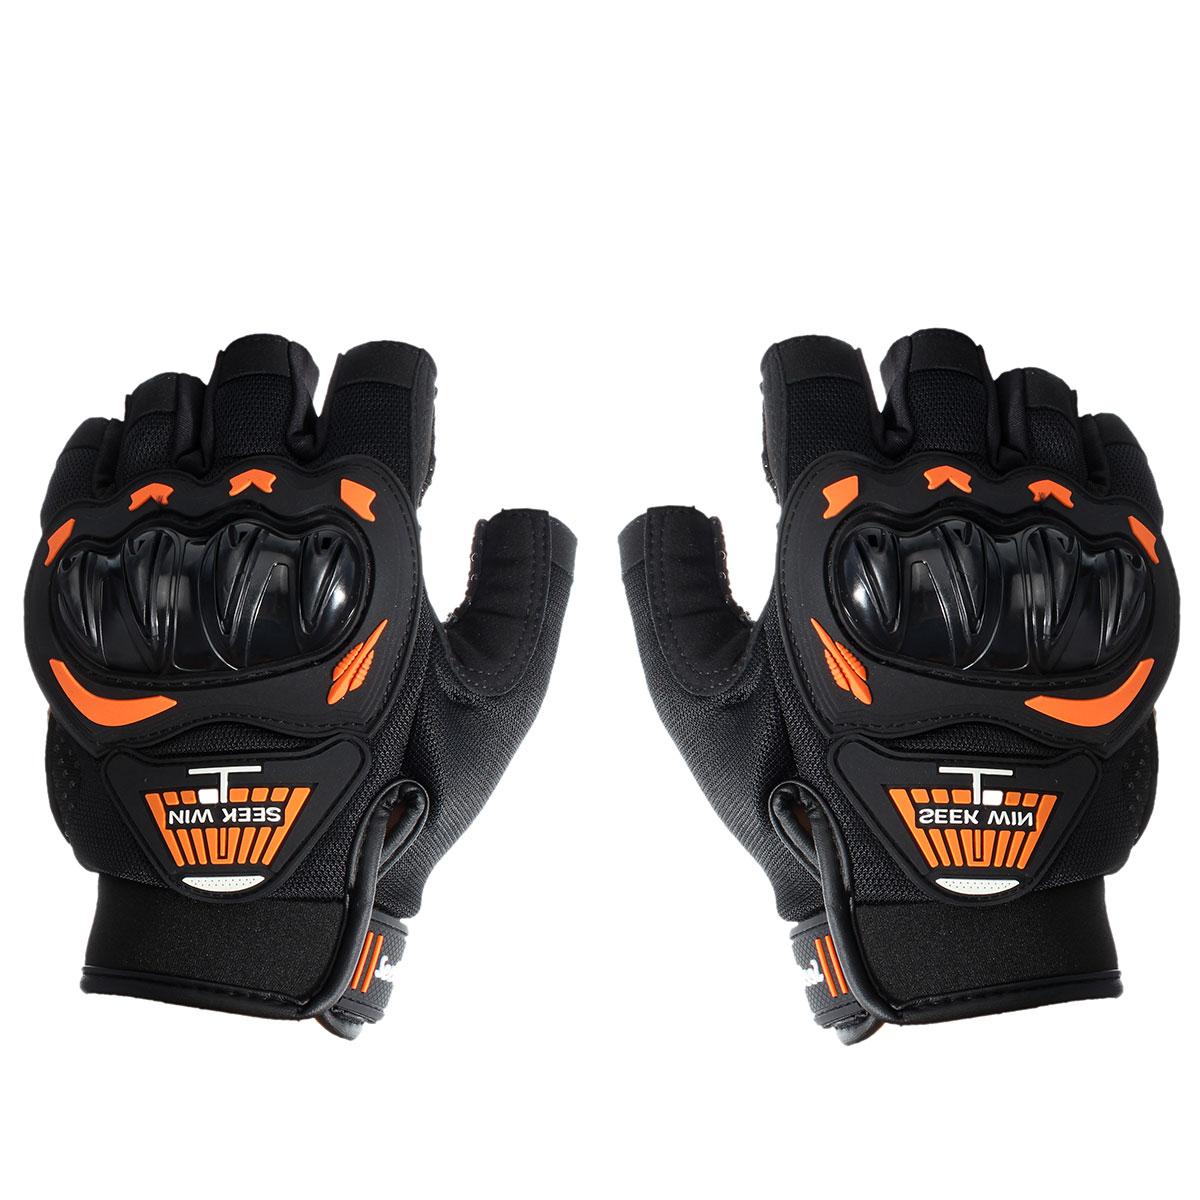 Motorcycle gloves half finger - Seek Win Sc 01b Probiker Racing Motocross Motorbike Protective Half Finger Motorcycle Gloves China